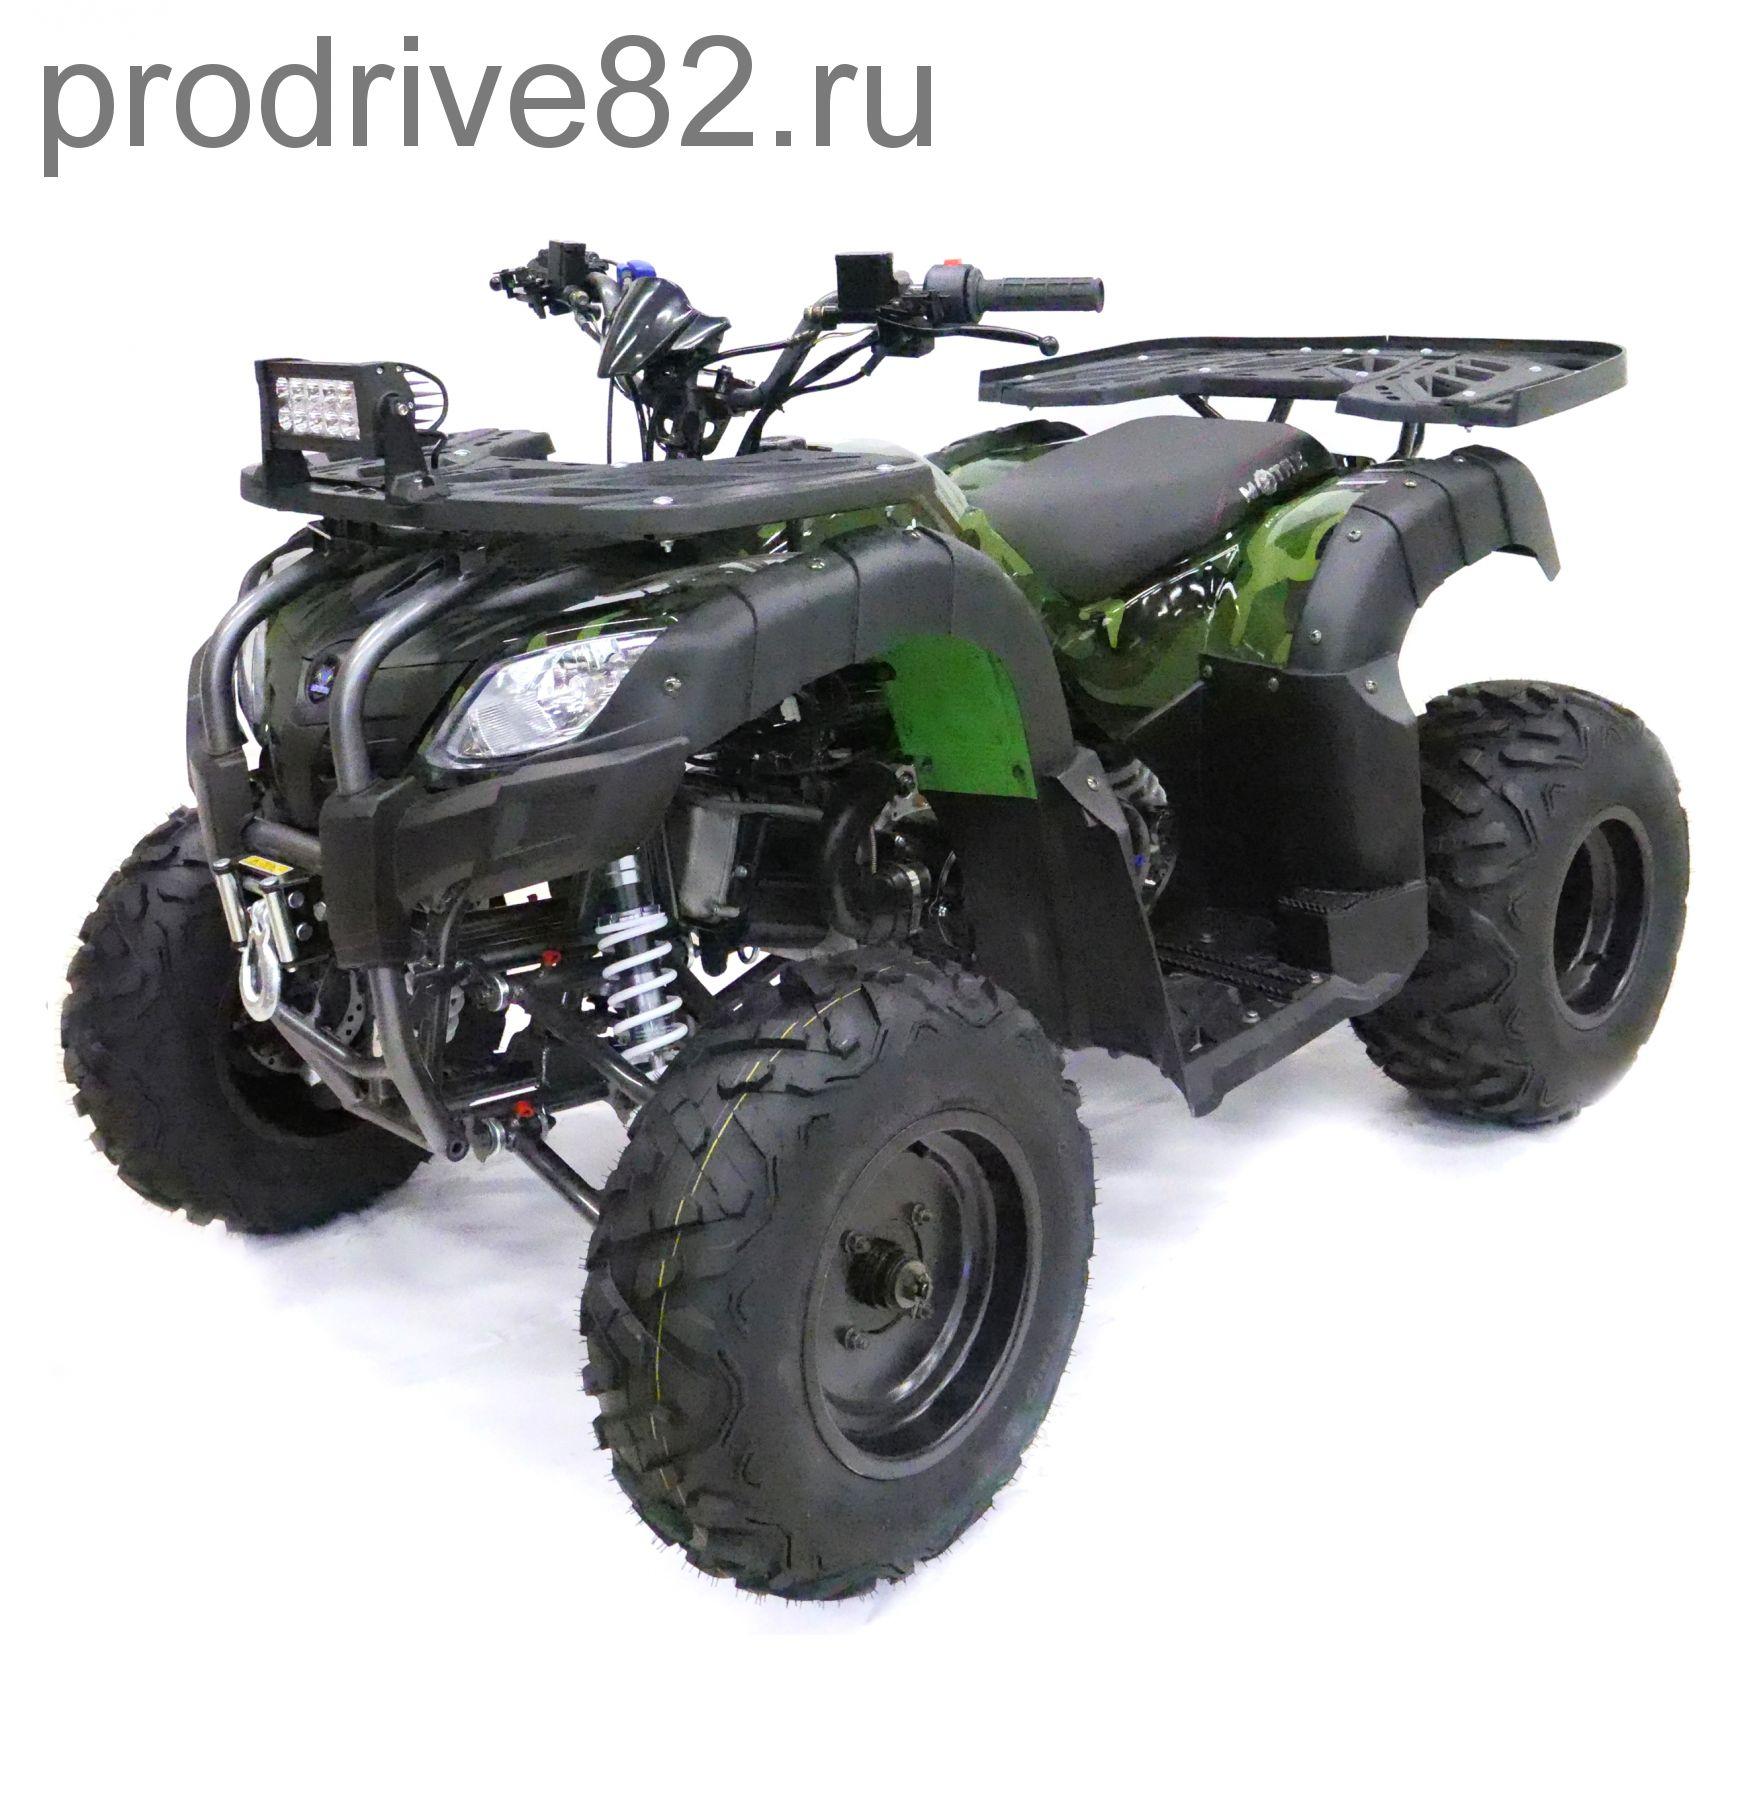 MOTAX ATV Grizlik 200 сс LUX